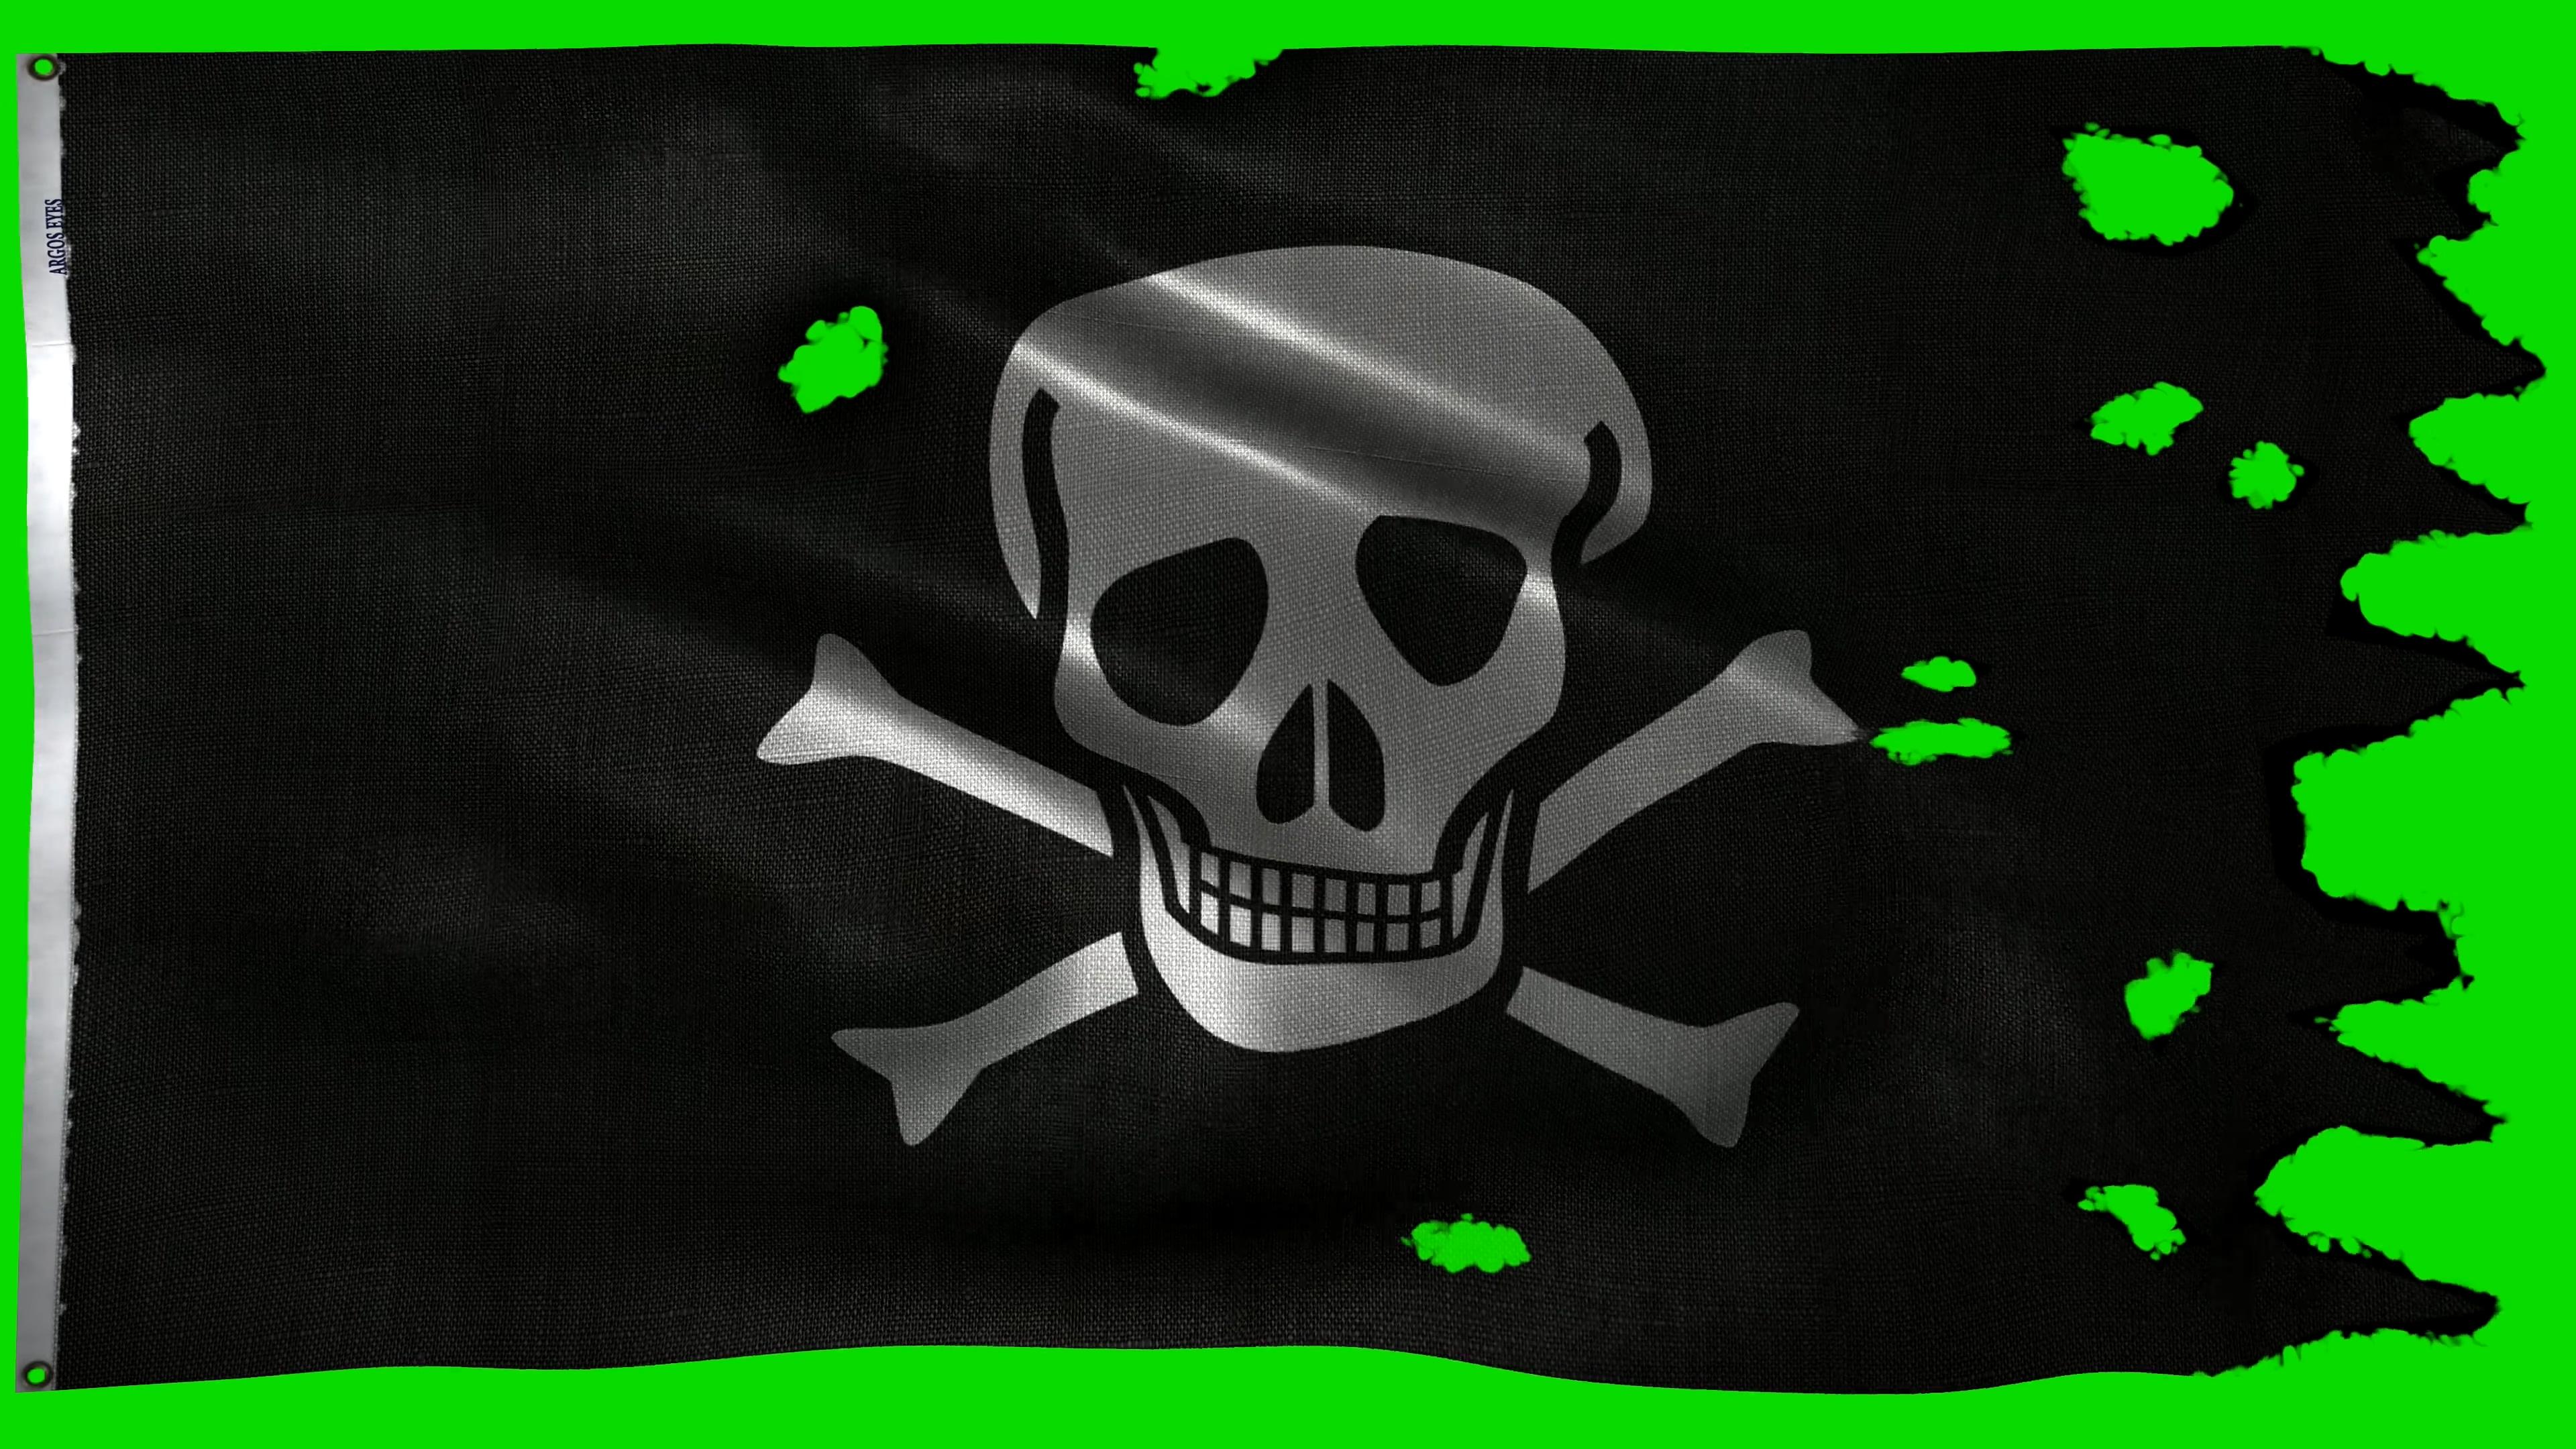 \[4K\]绿屏抠像飘扬的黑色海盗旗